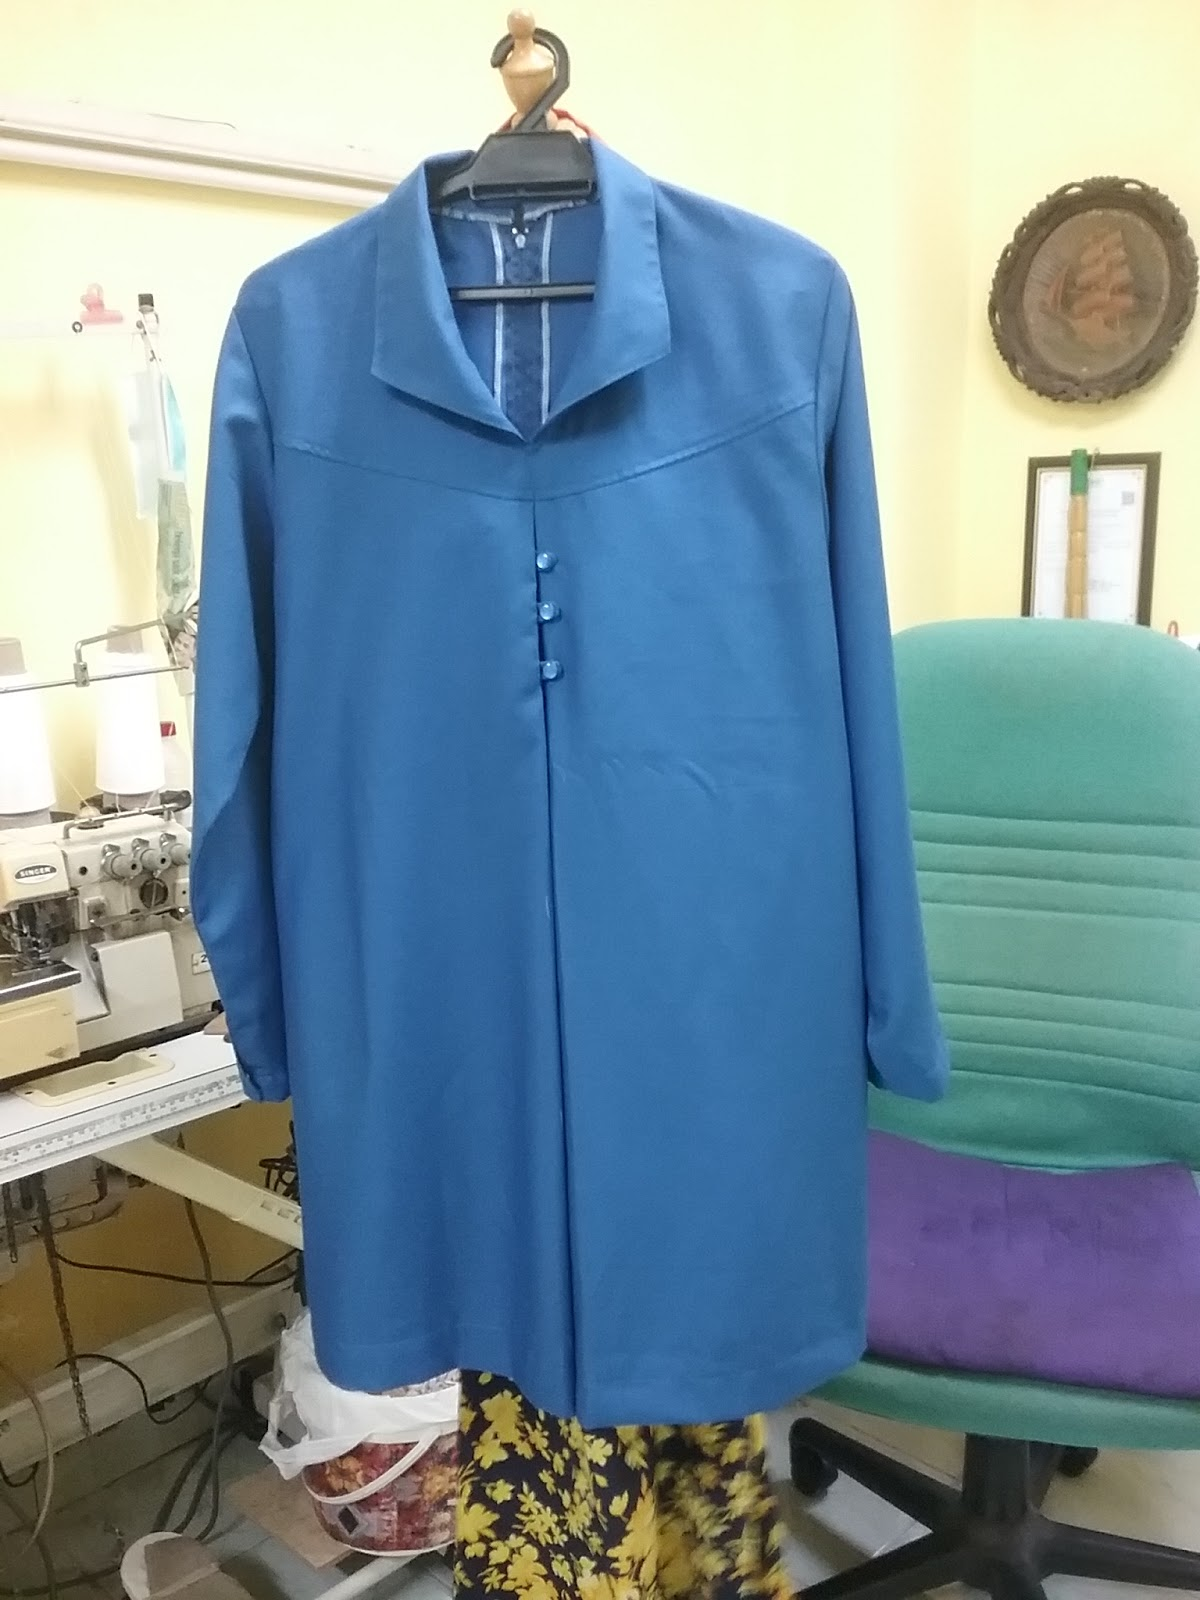 Kedai Jahit Normie Uniform Pregnant Nurse Kpj